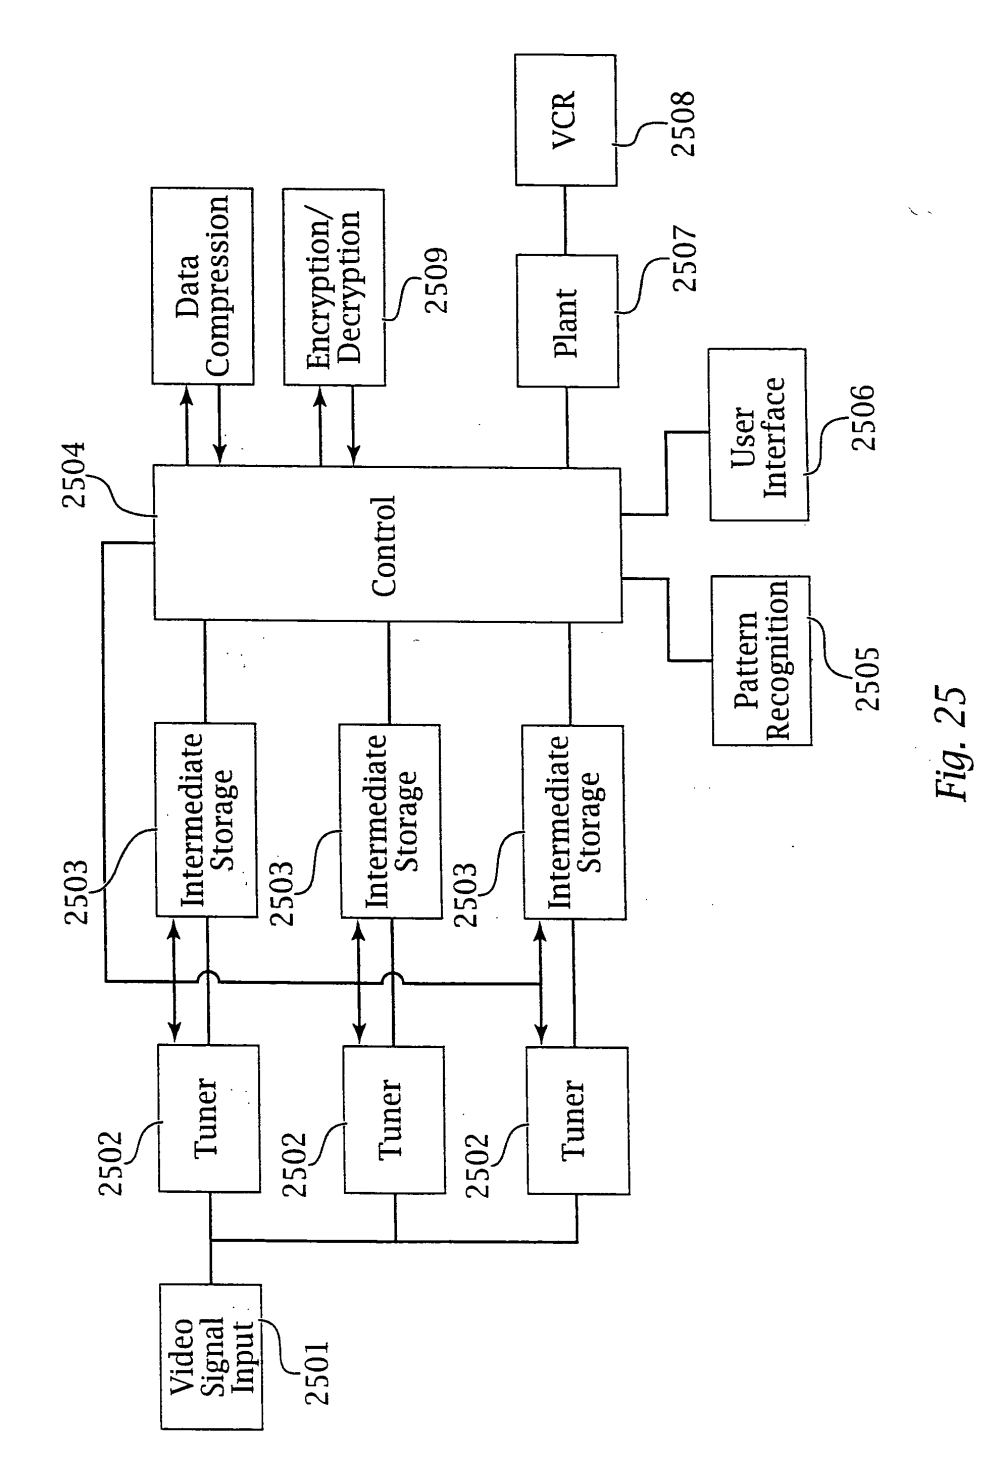 medium resolution of somfy rt wiring diagram